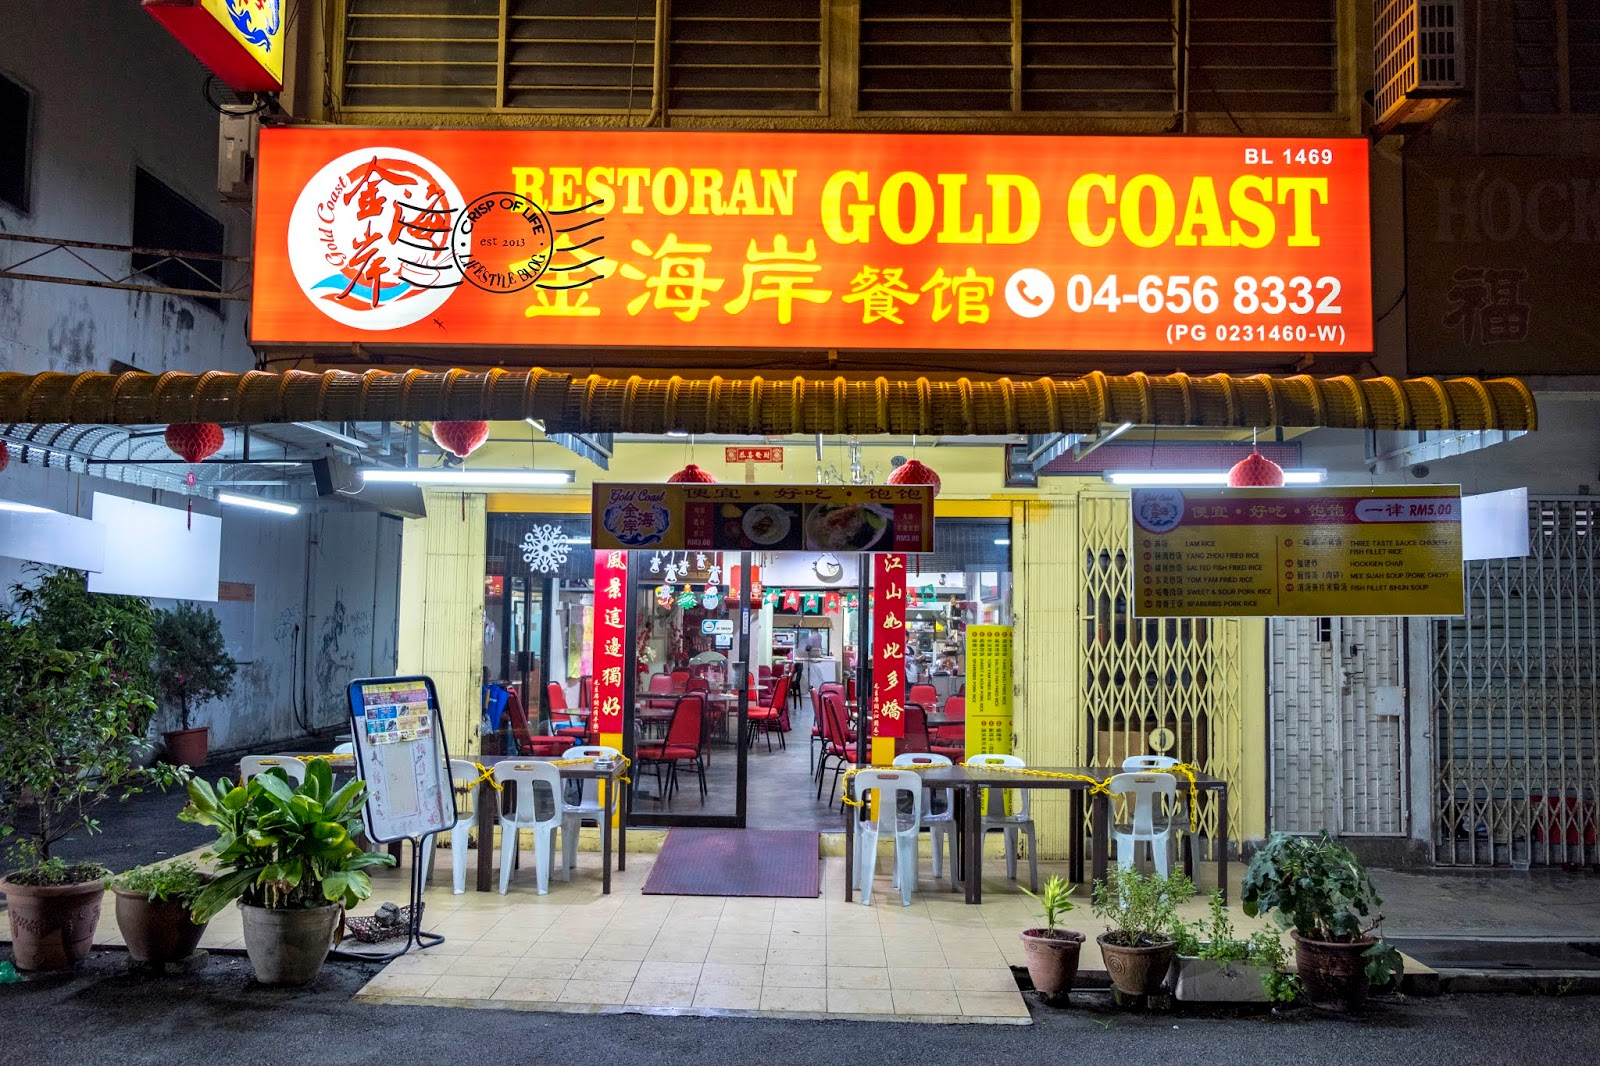 Gold Coast Restaurant 金海岸餐馆 at Island Park Penang